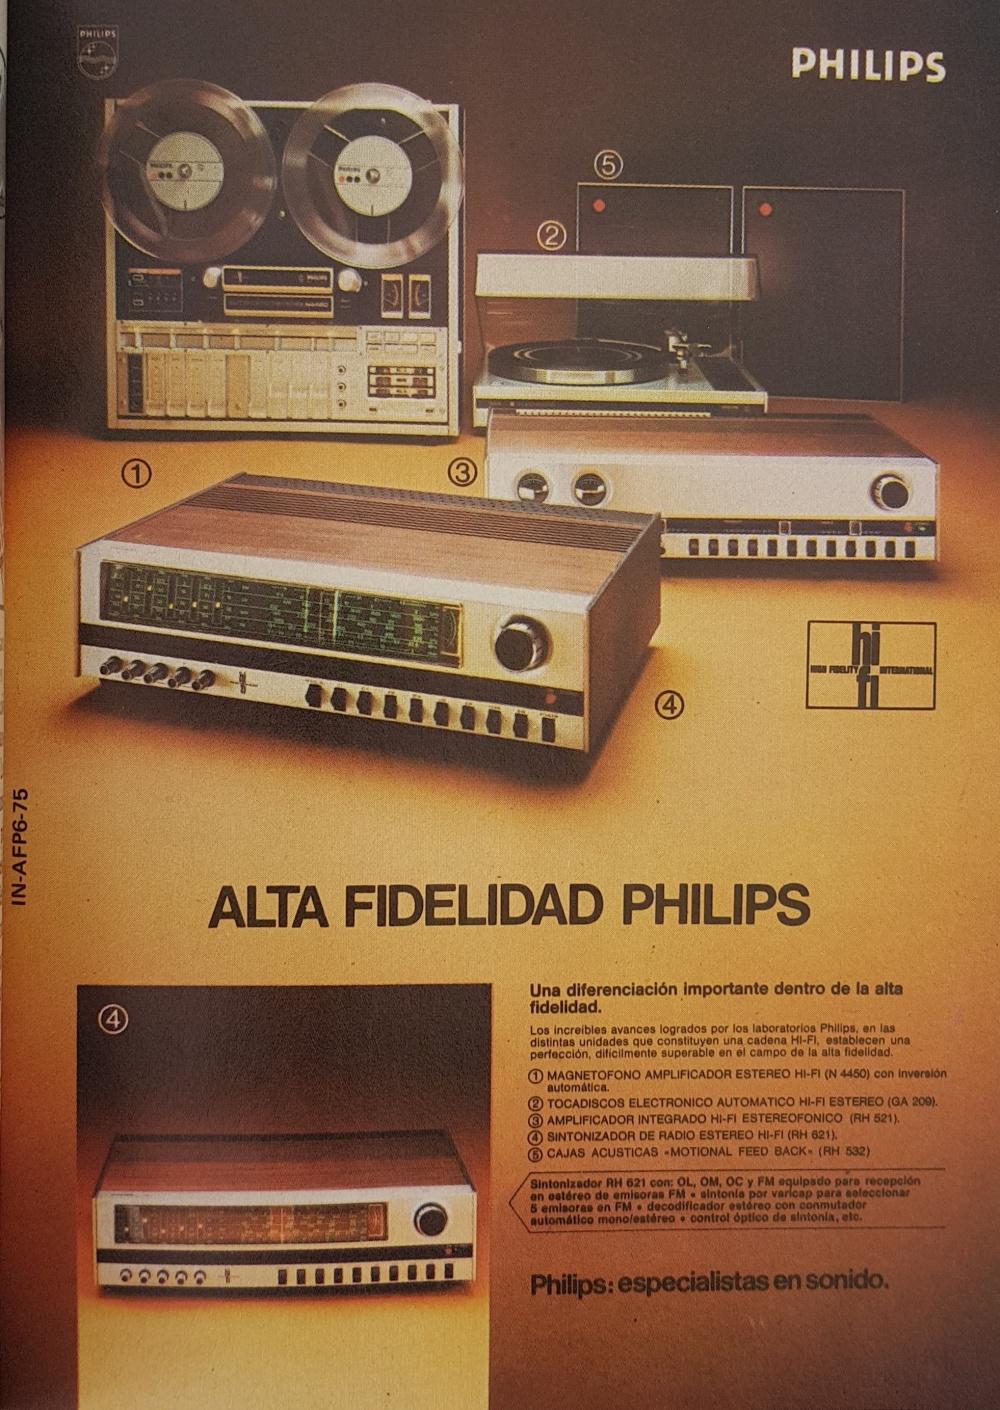 Philips-Espanha-1975.jpg